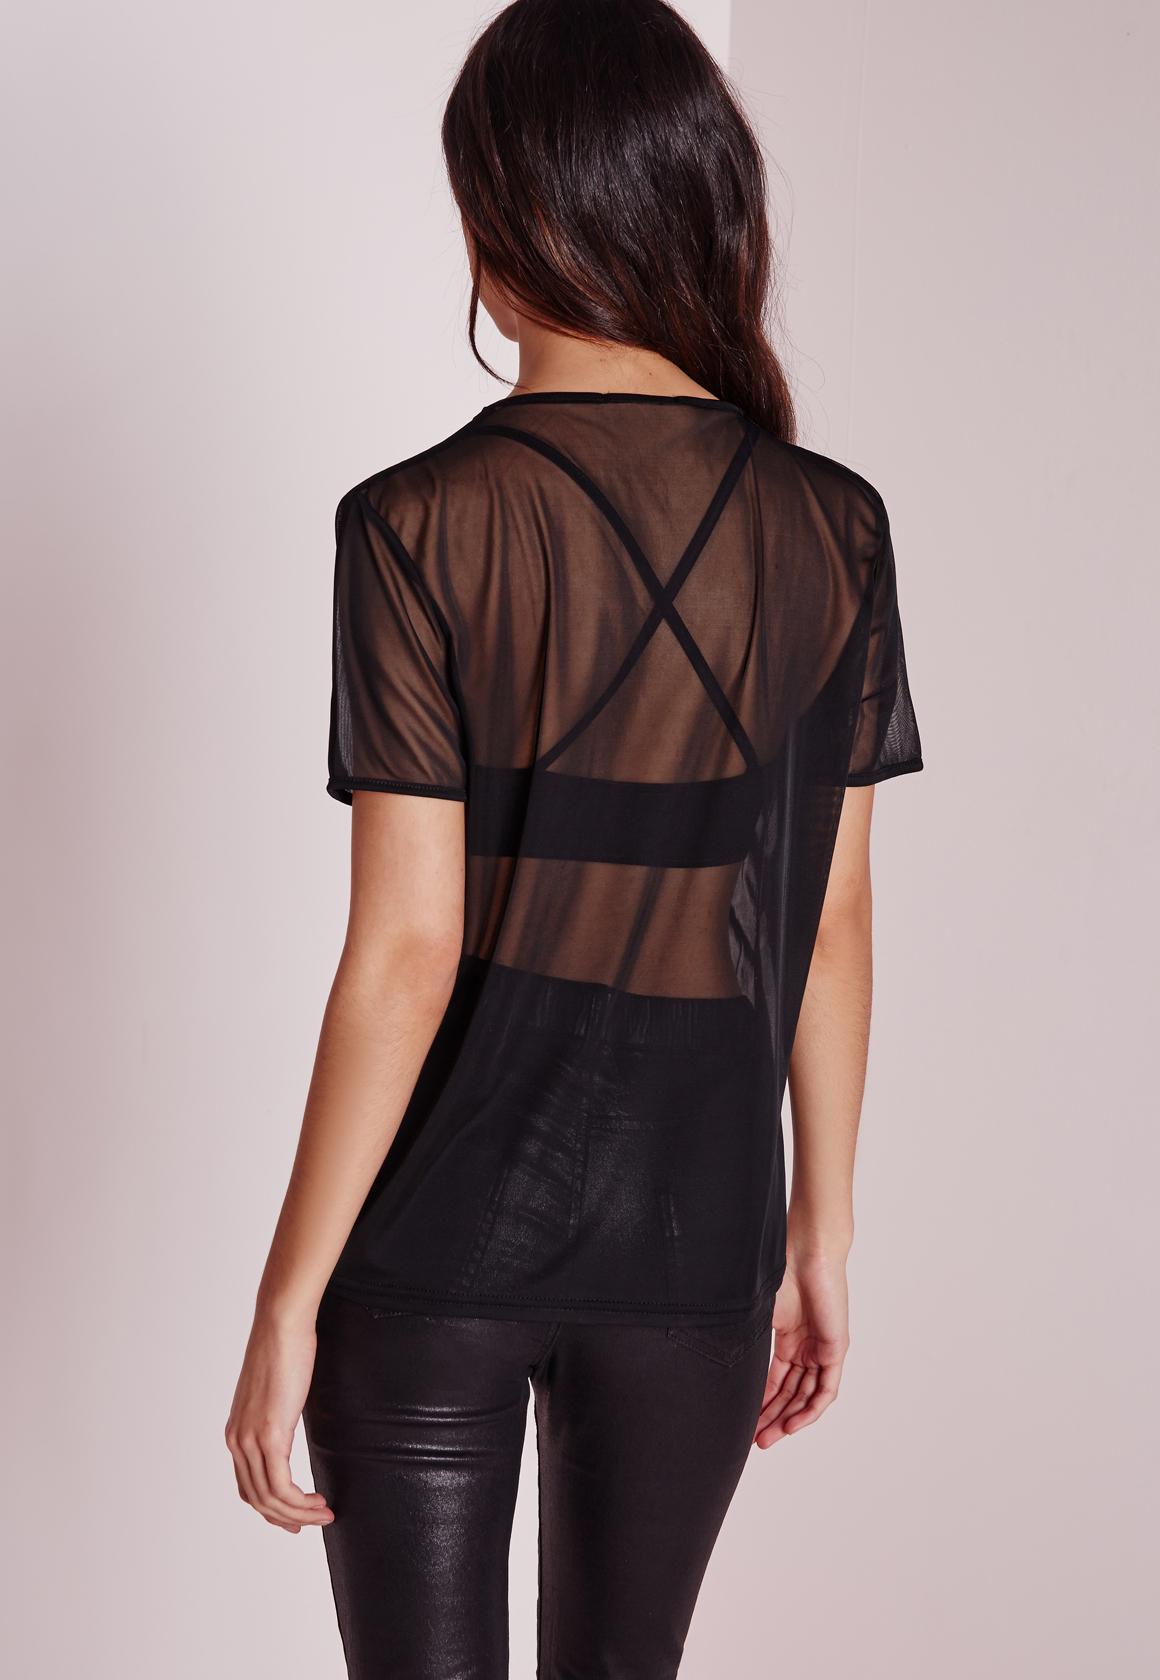 Missguided Petite Mesh T-shirt Black in Black